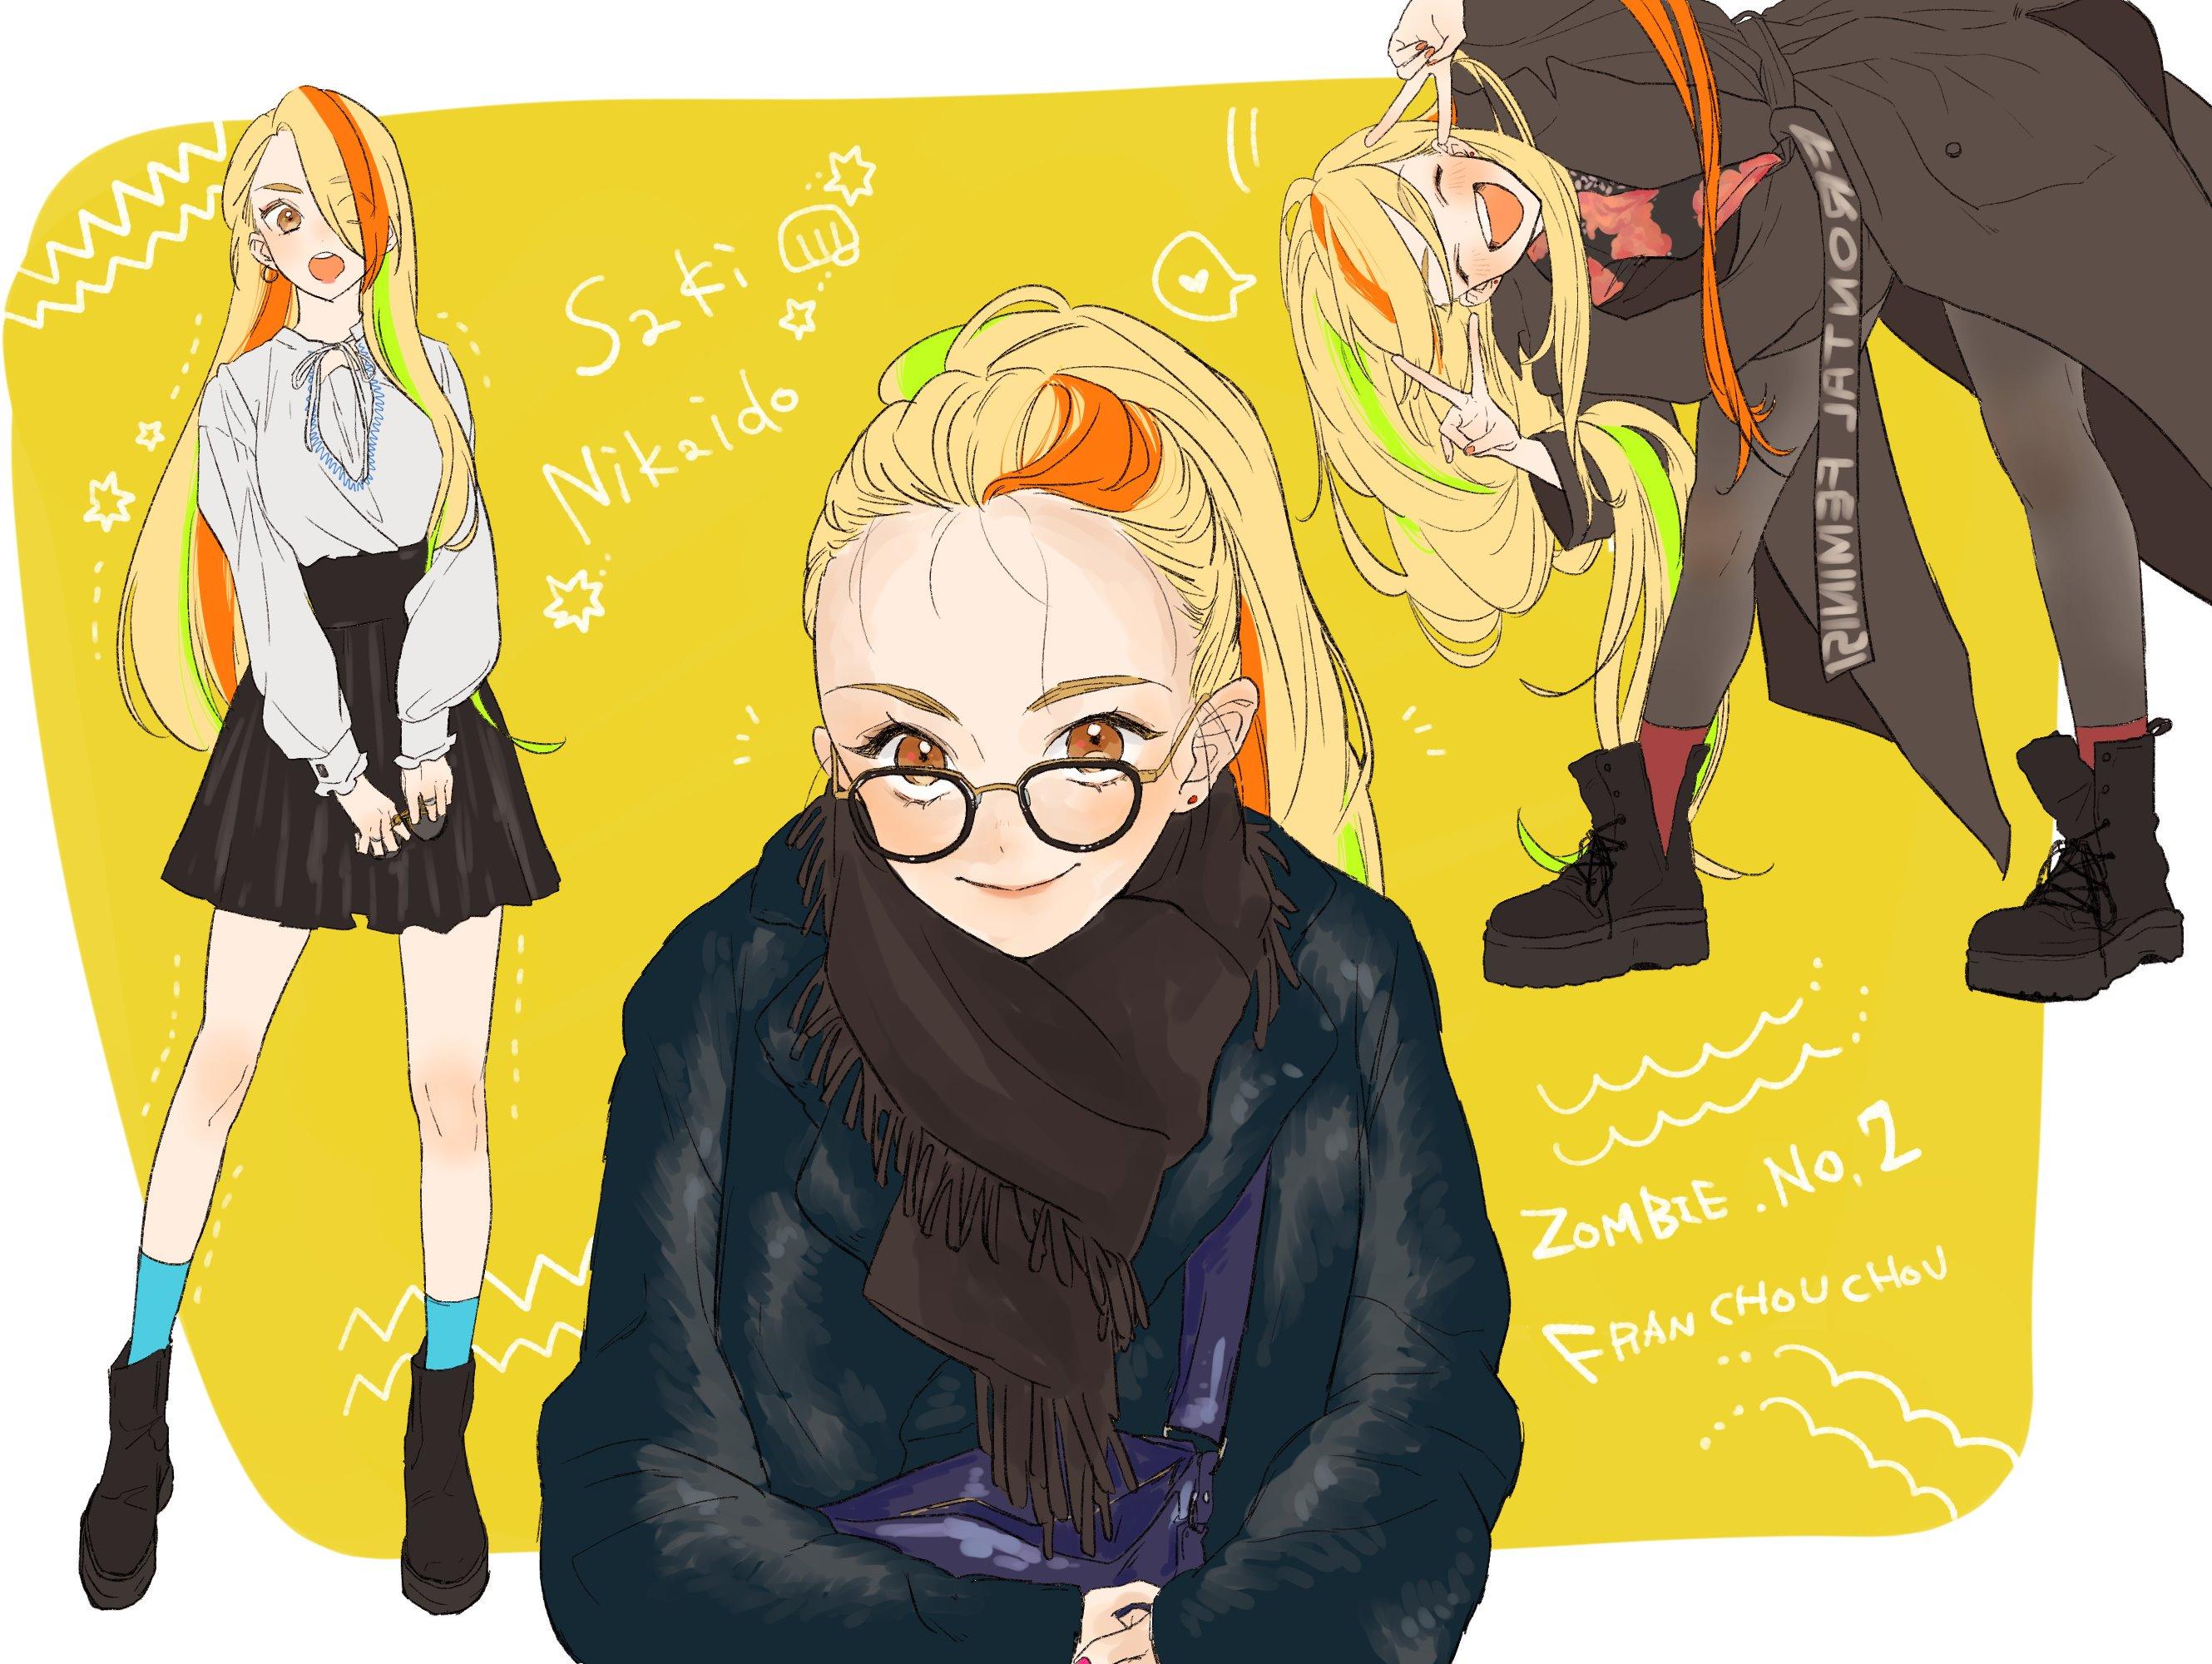 Anime 2659x2000 Zombieland Saga anime girls school uniform Zombie 2 / Saki Nikaidou